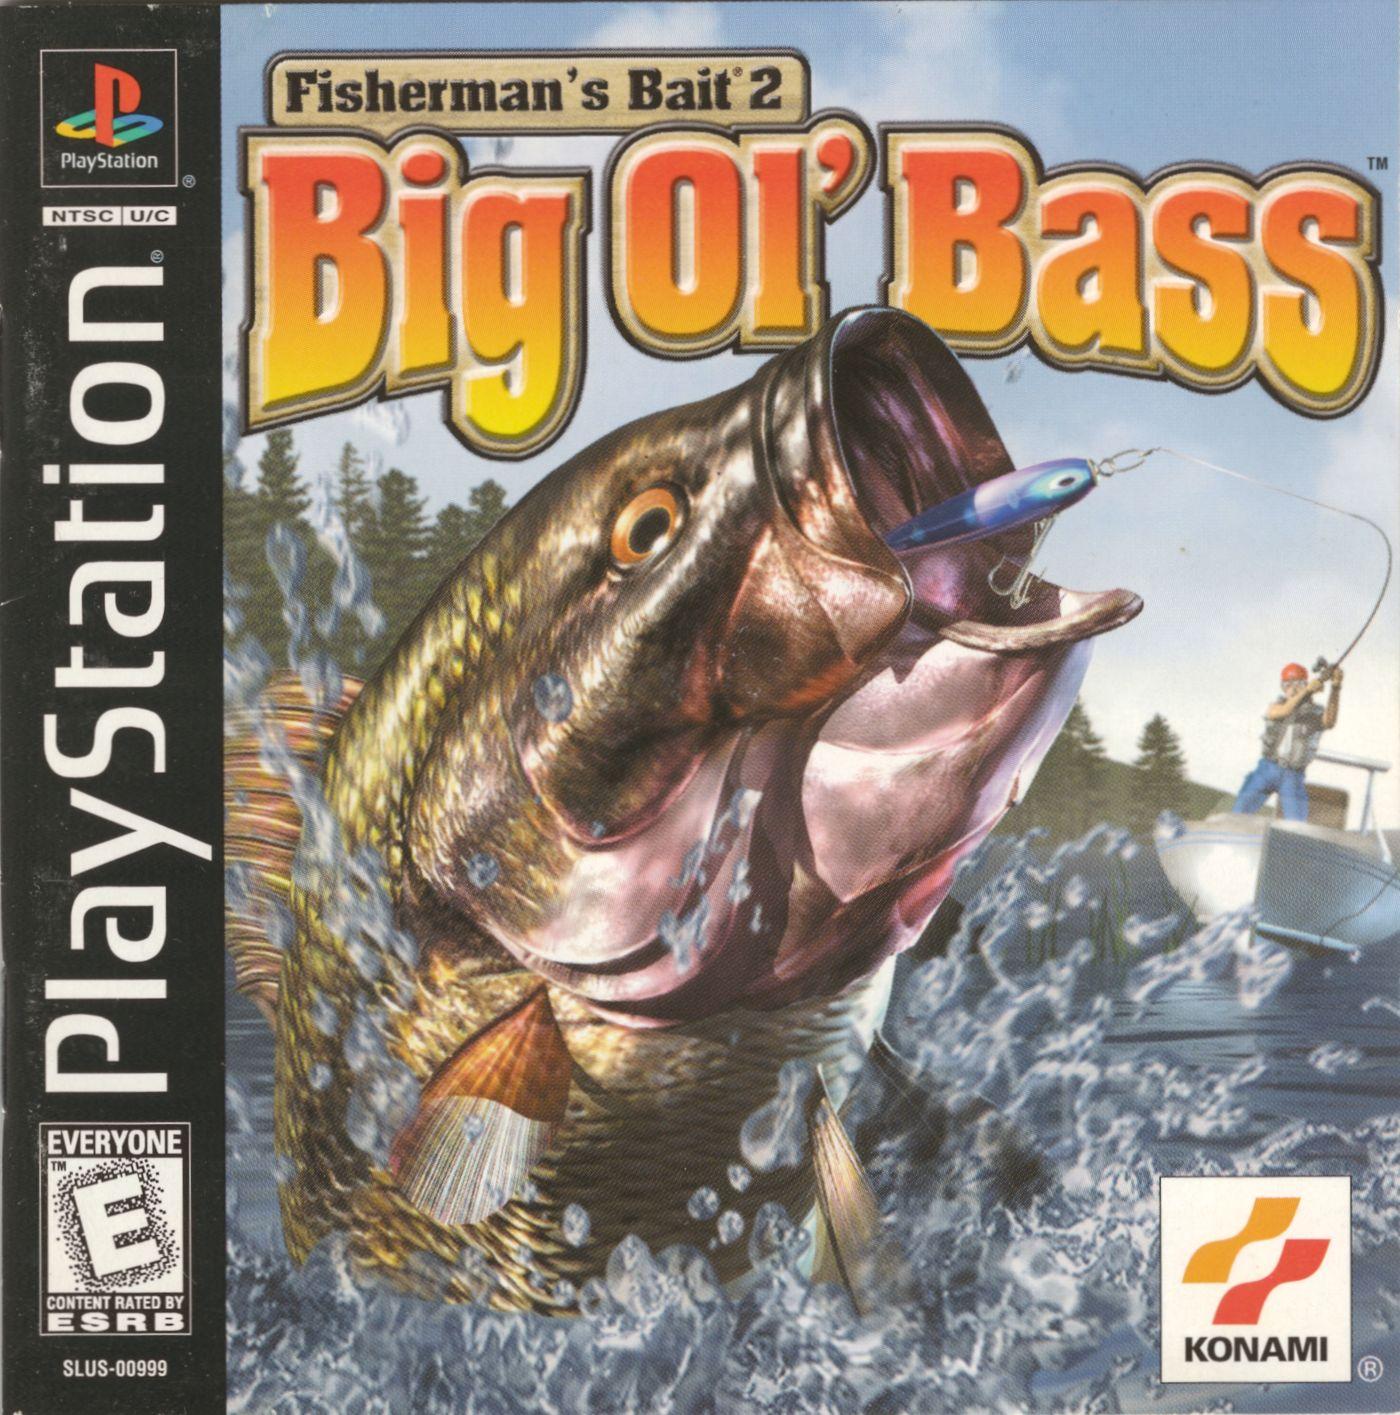 Big ol bass 2 ps1 iso download game ps1 psp roms isos | downarea51.